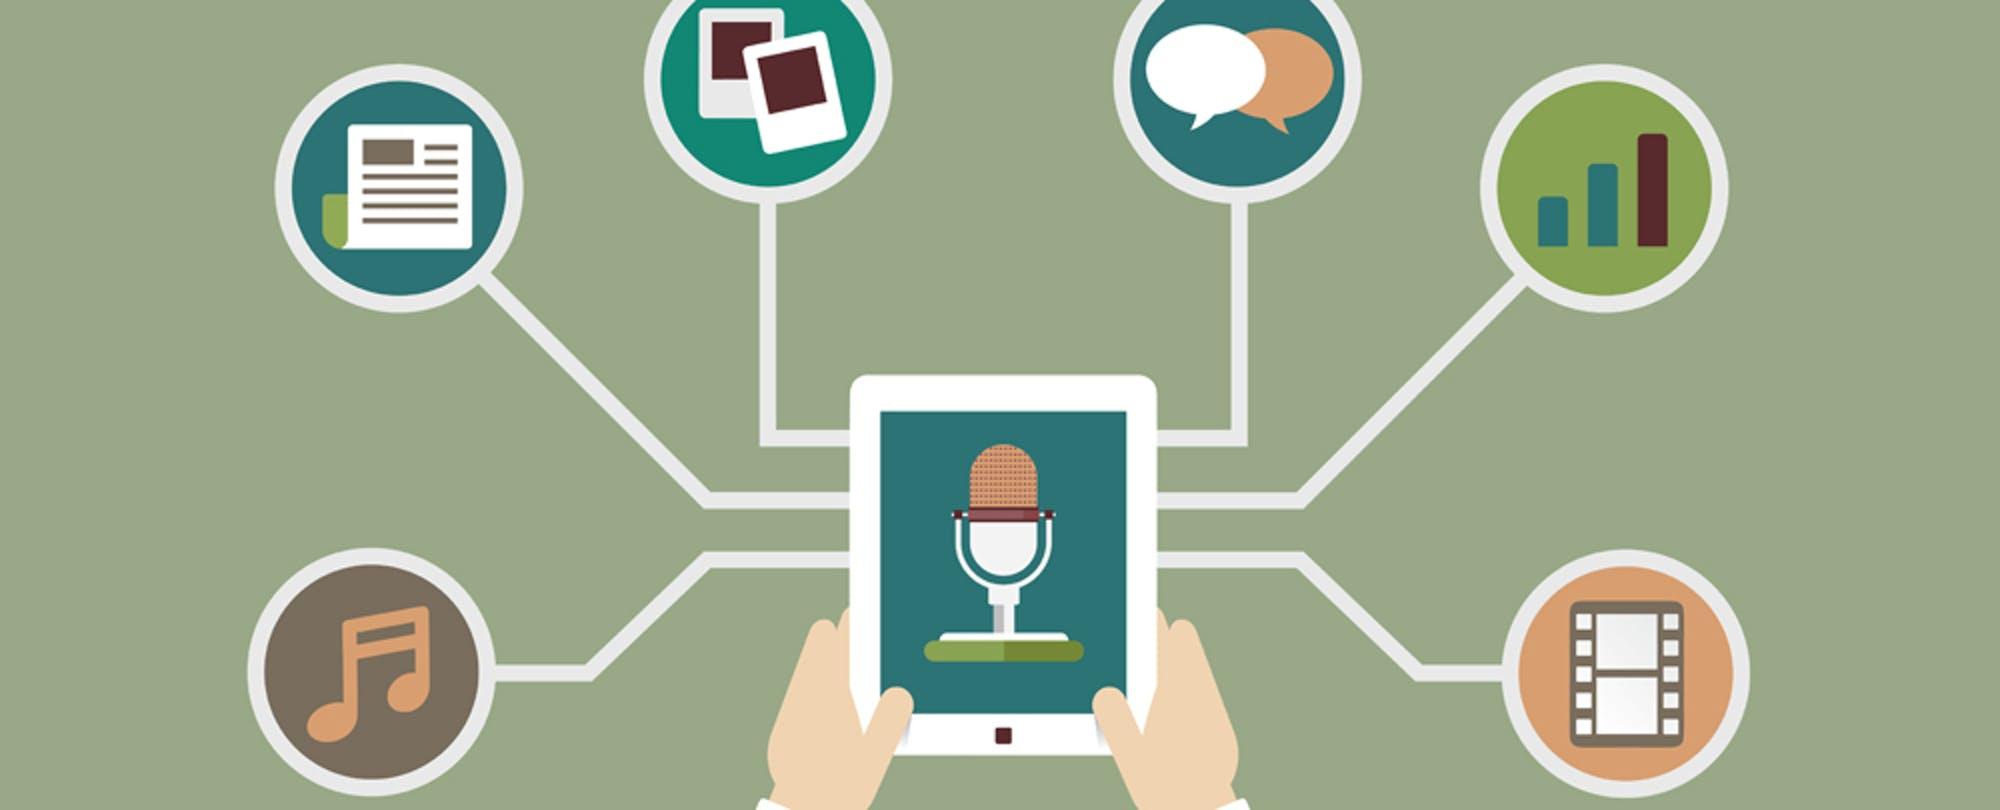 Colleges Want More Digital Courseware, Fewer MOOCs